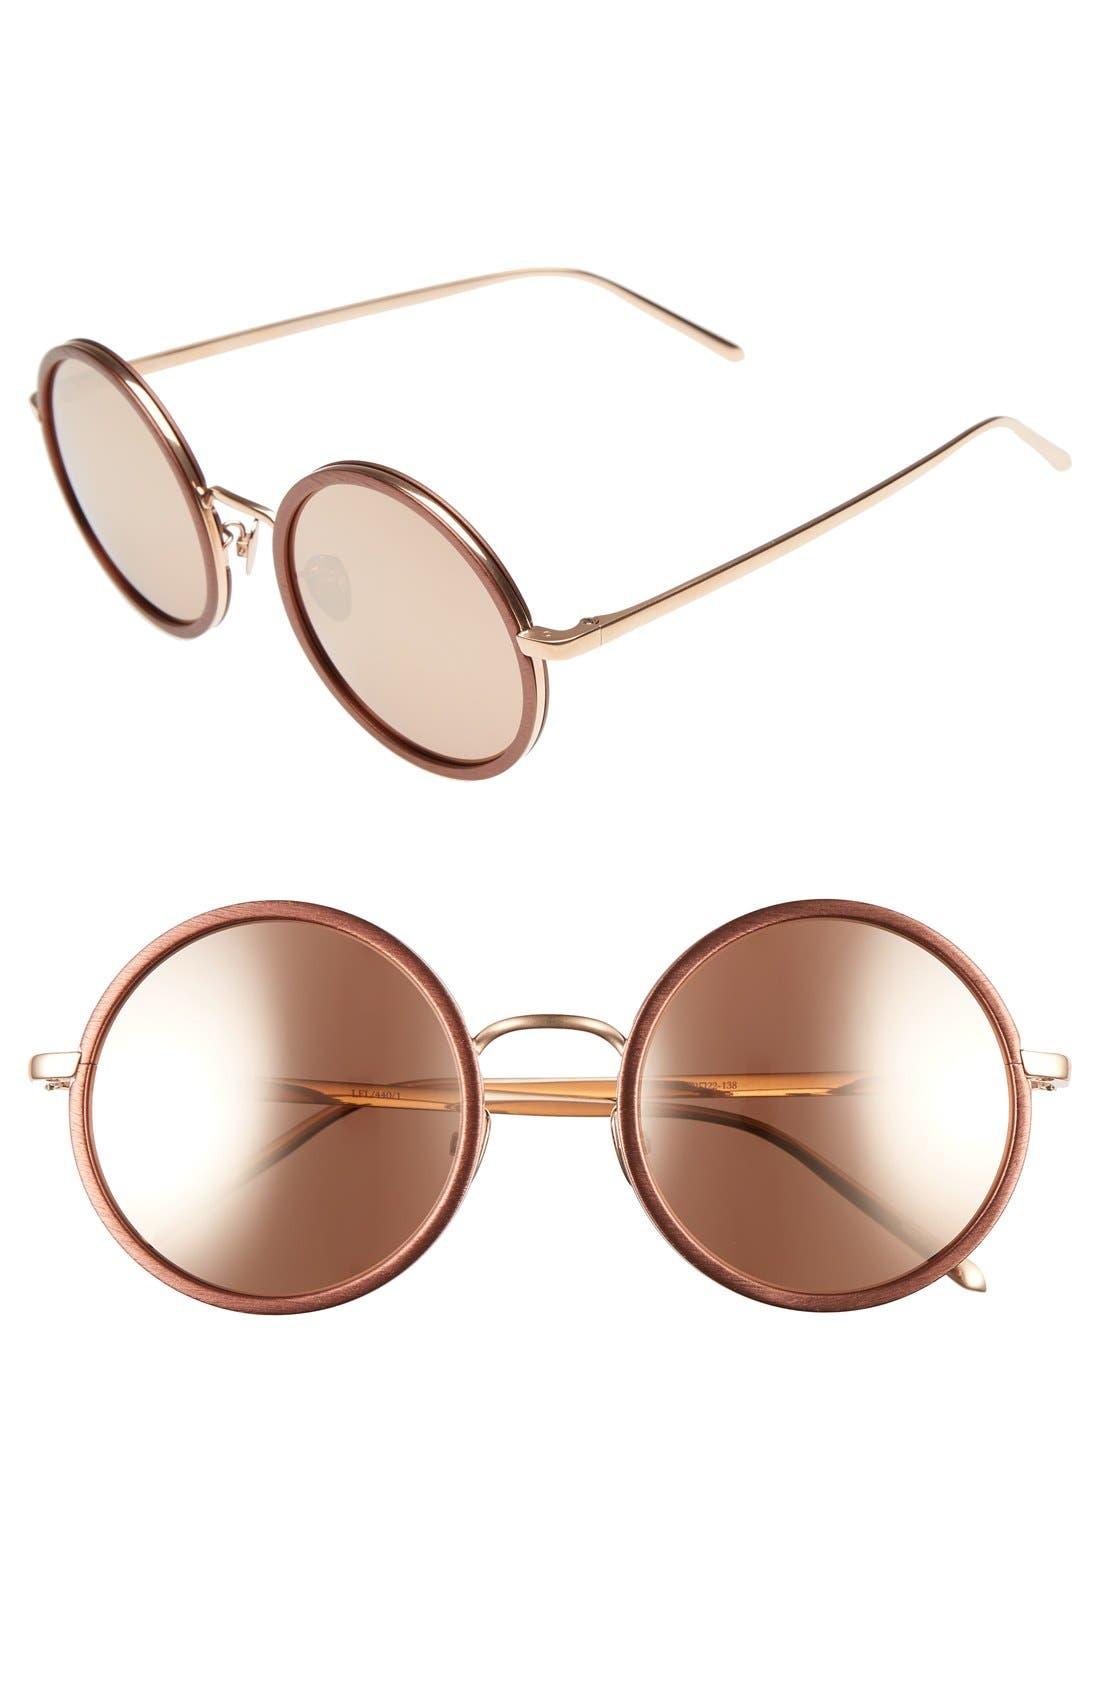 Main Image - Linda Farrow 52mm Round 18 Karat Rose Gold Trim Sunglasses